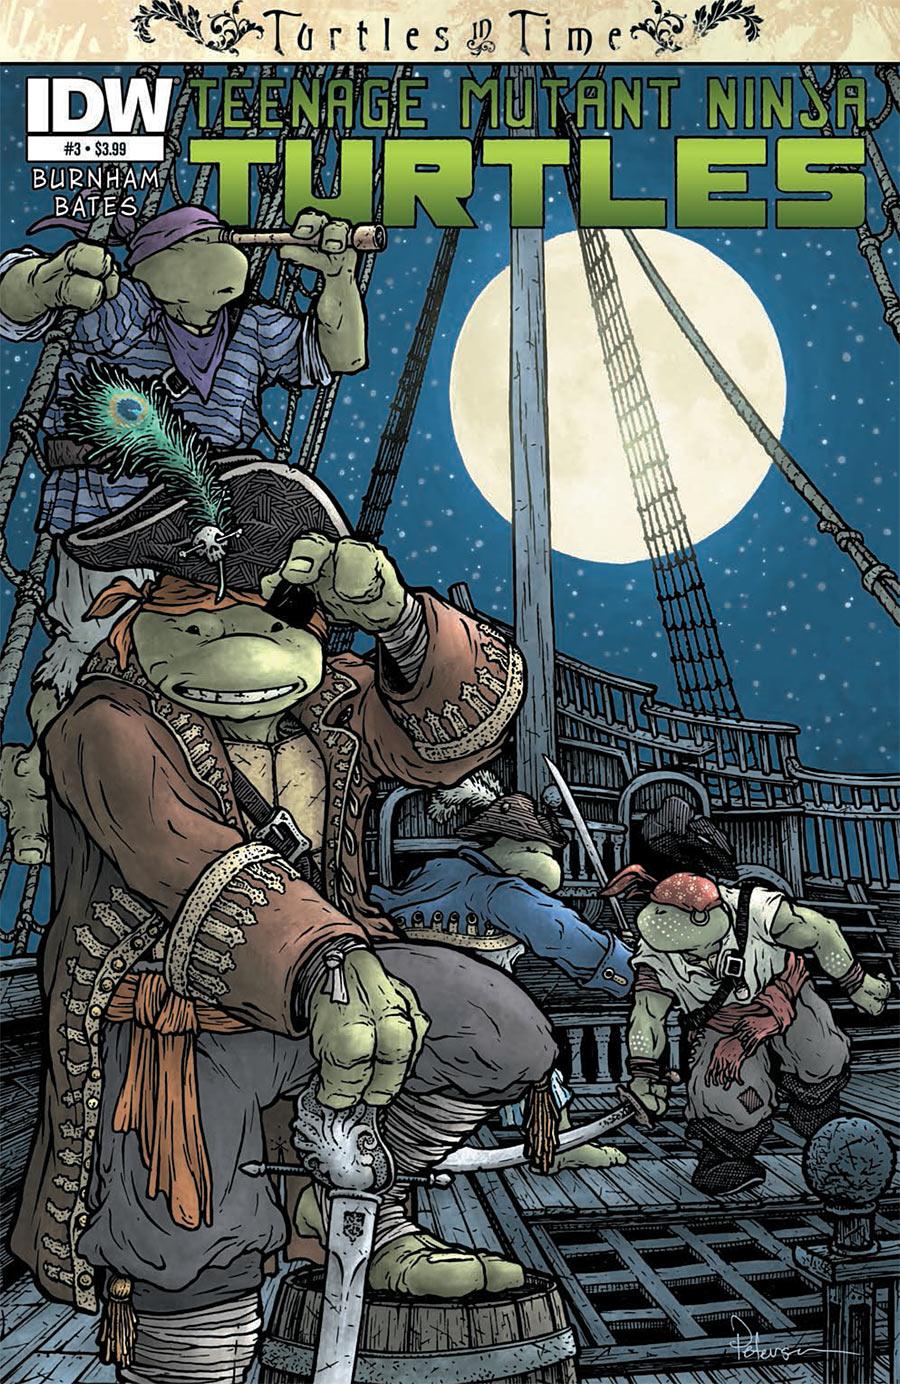 Teenage Mutant Ninja Turtles: Turtles in Time #3